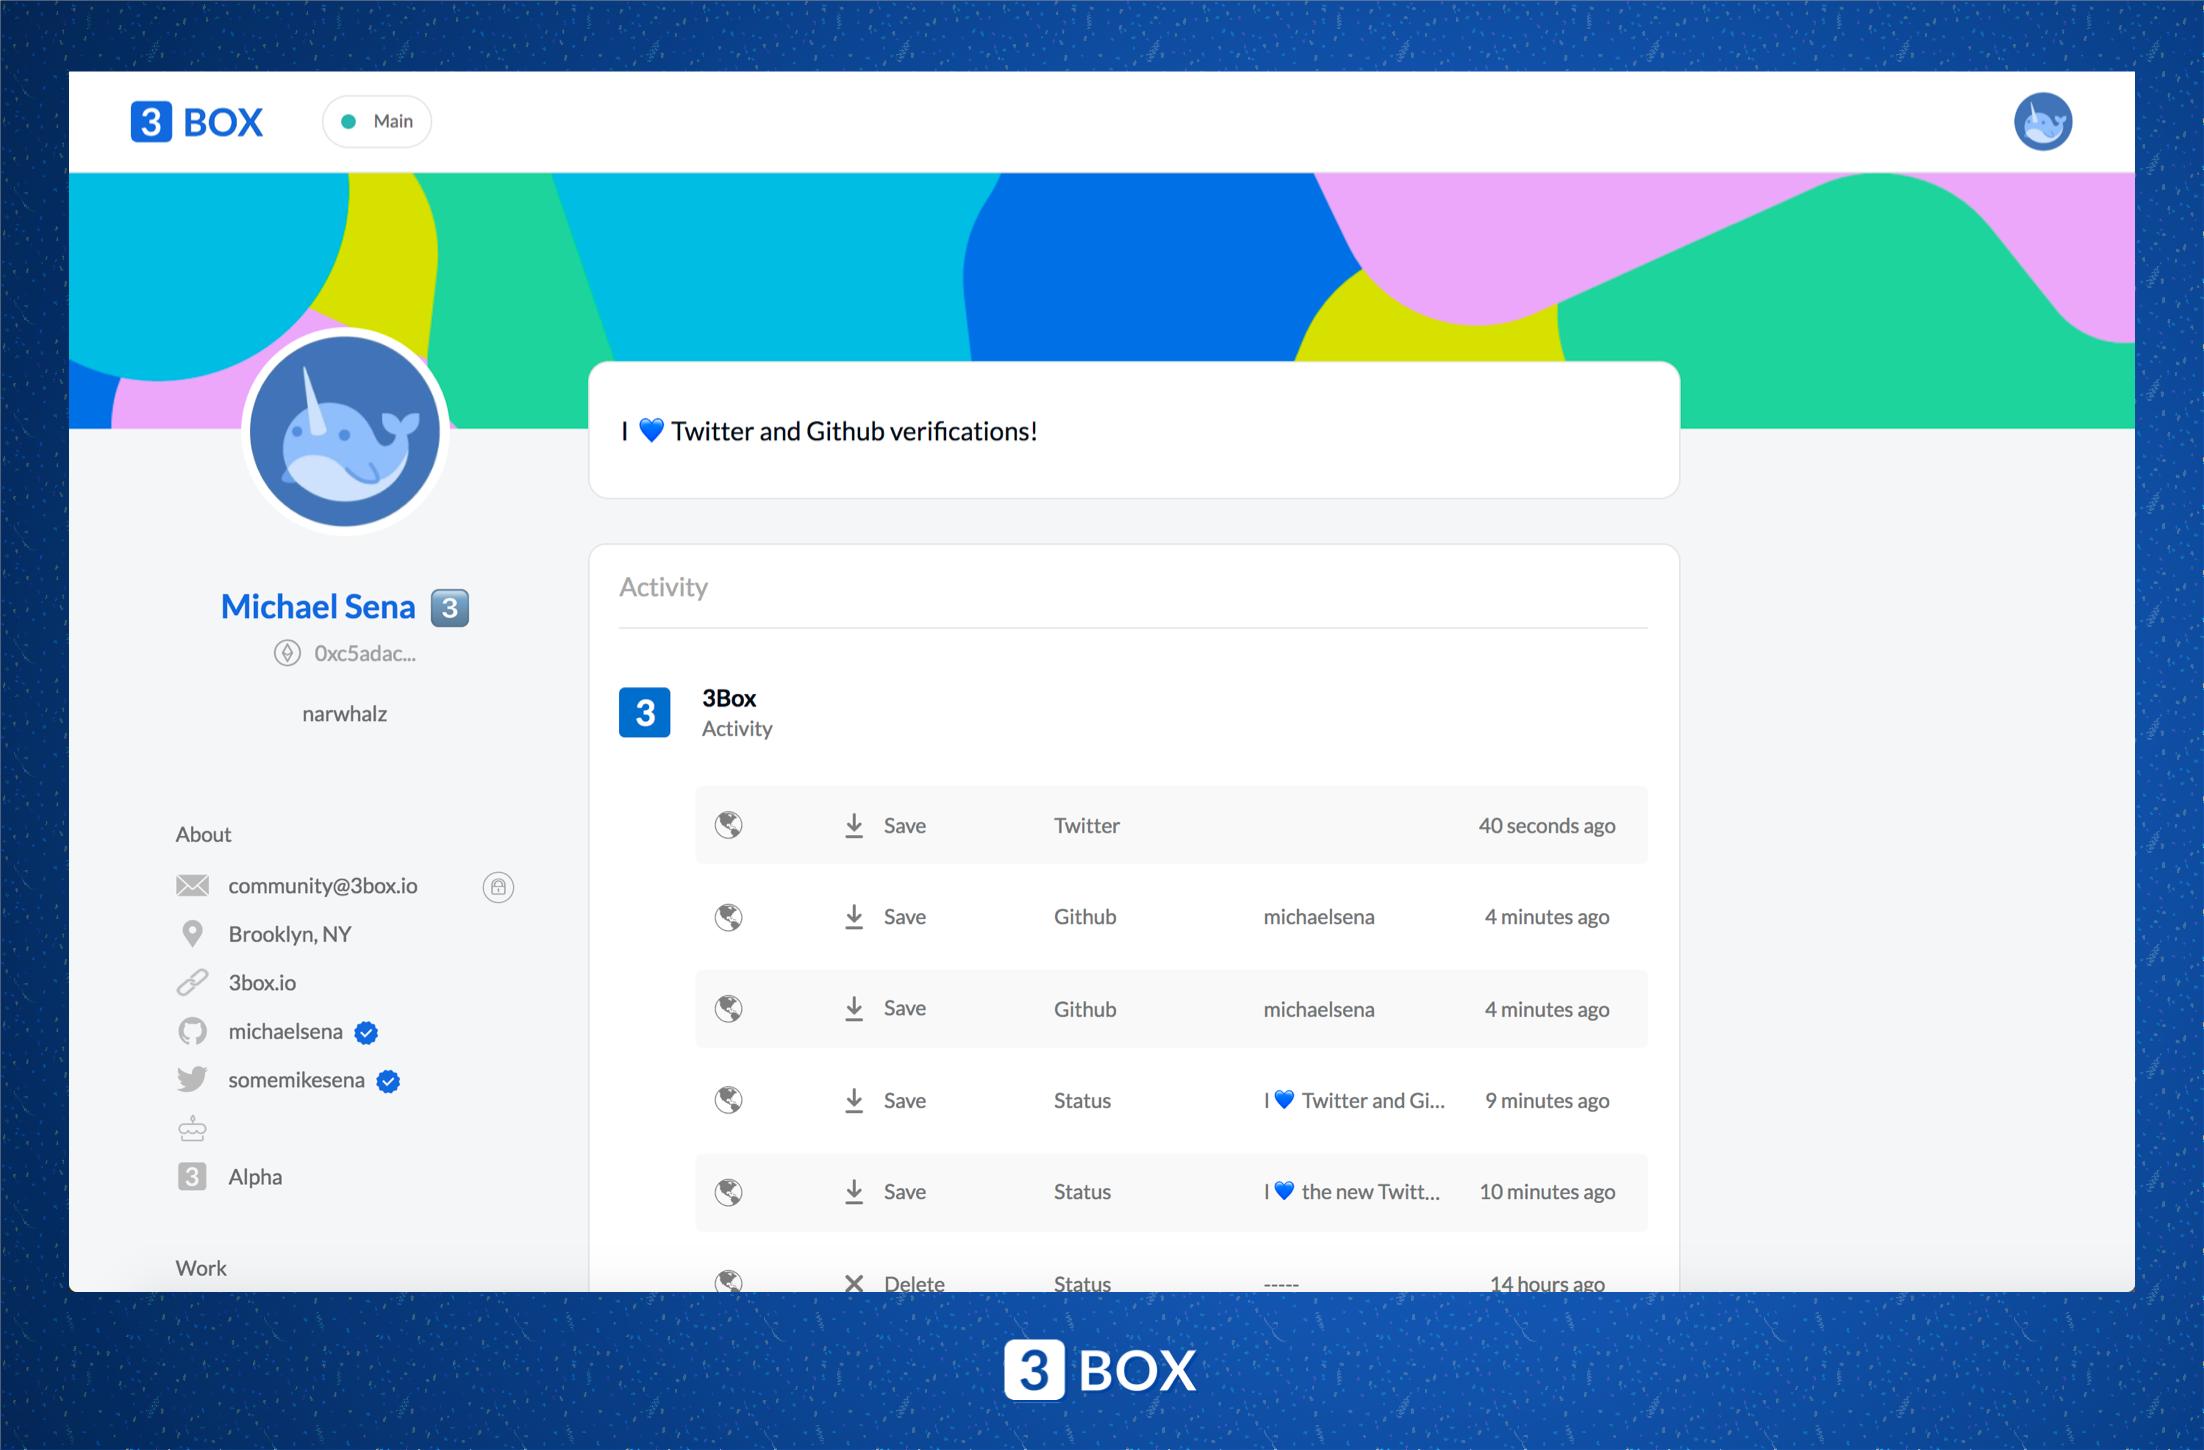 3Box Profiles App Hero Image